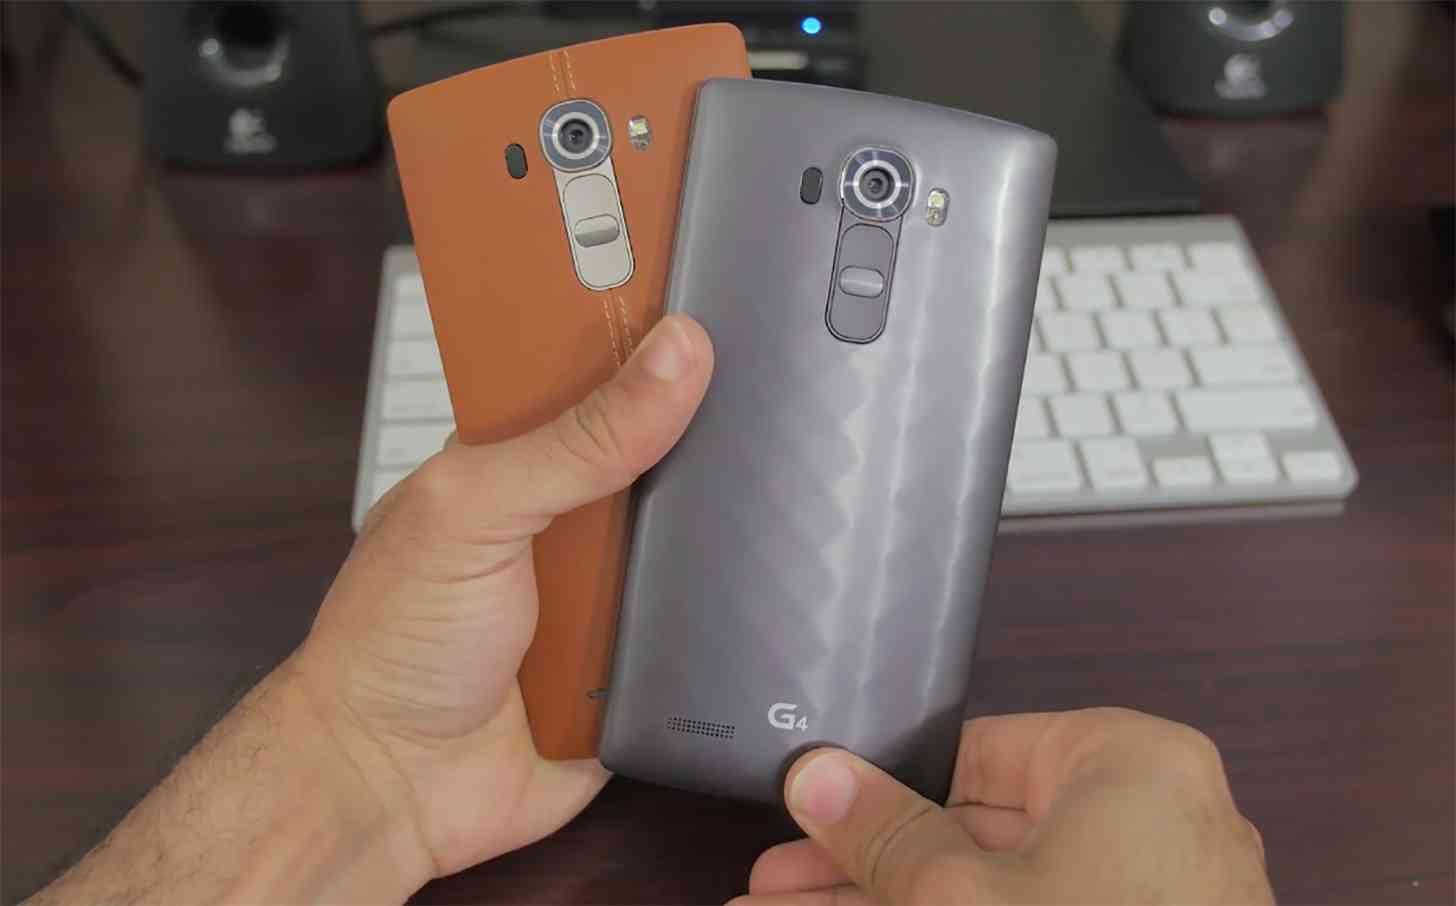 LG G4 leather plastic rear